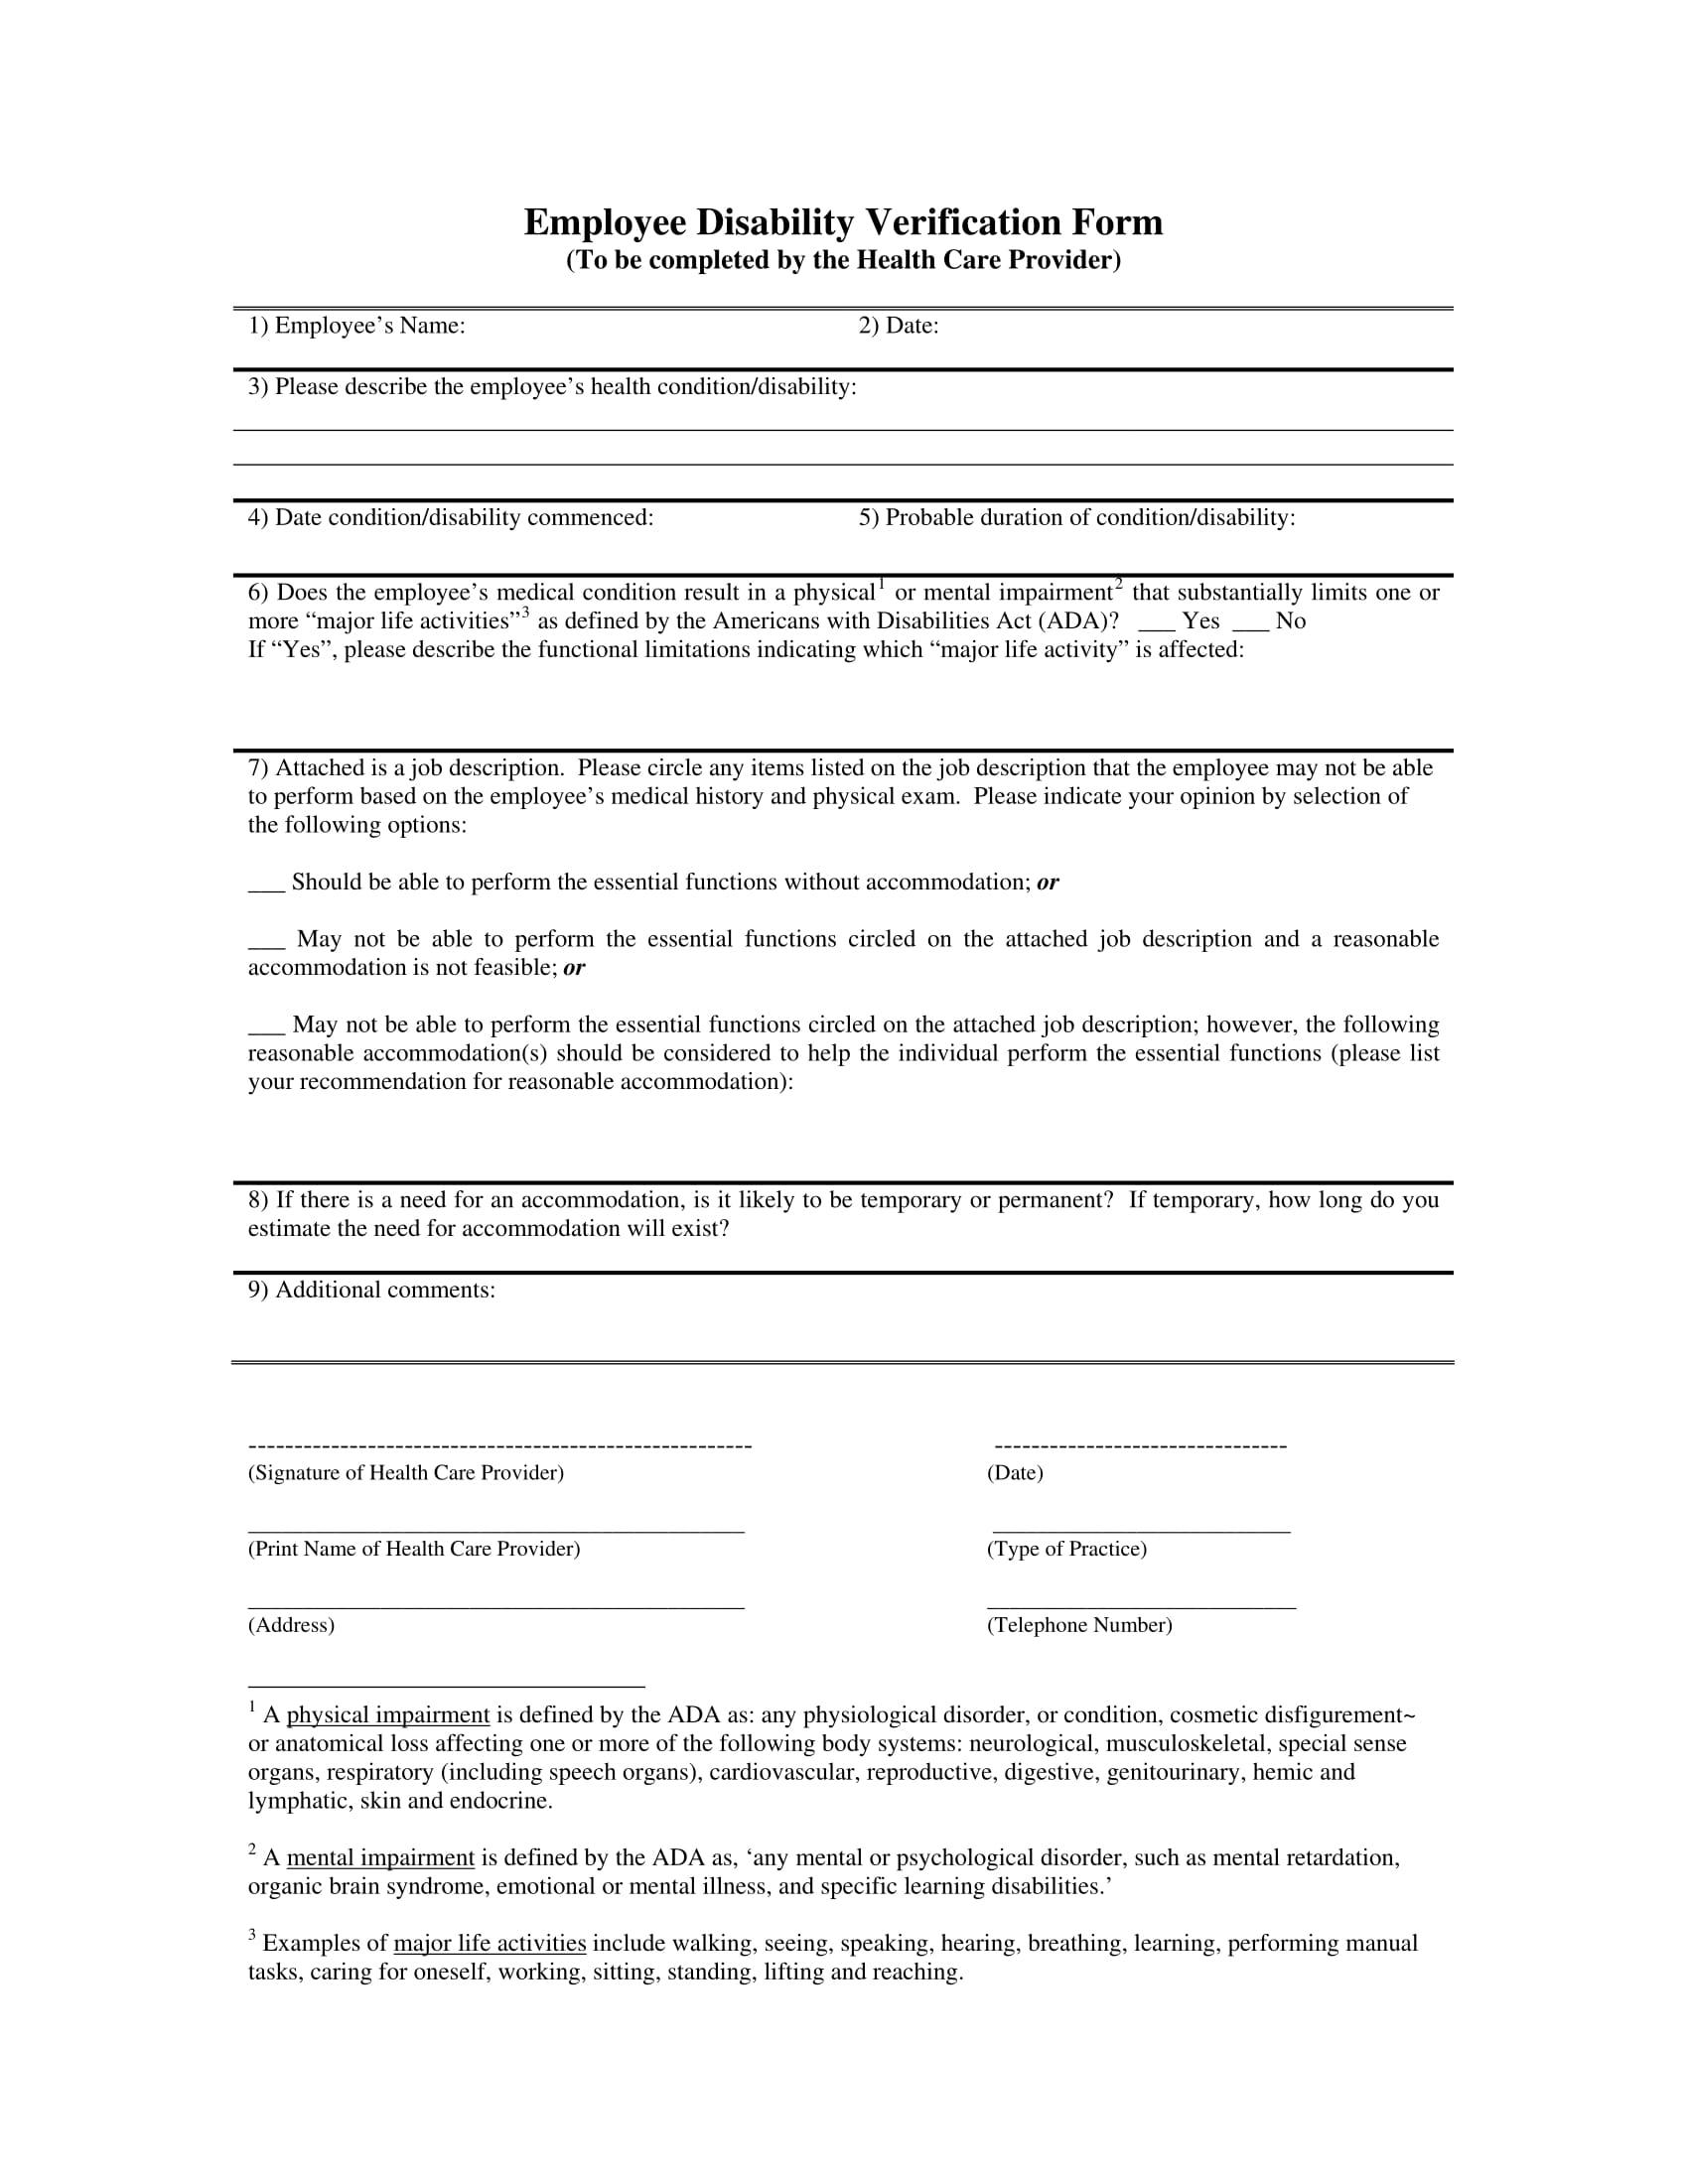 employee disability verification form 1